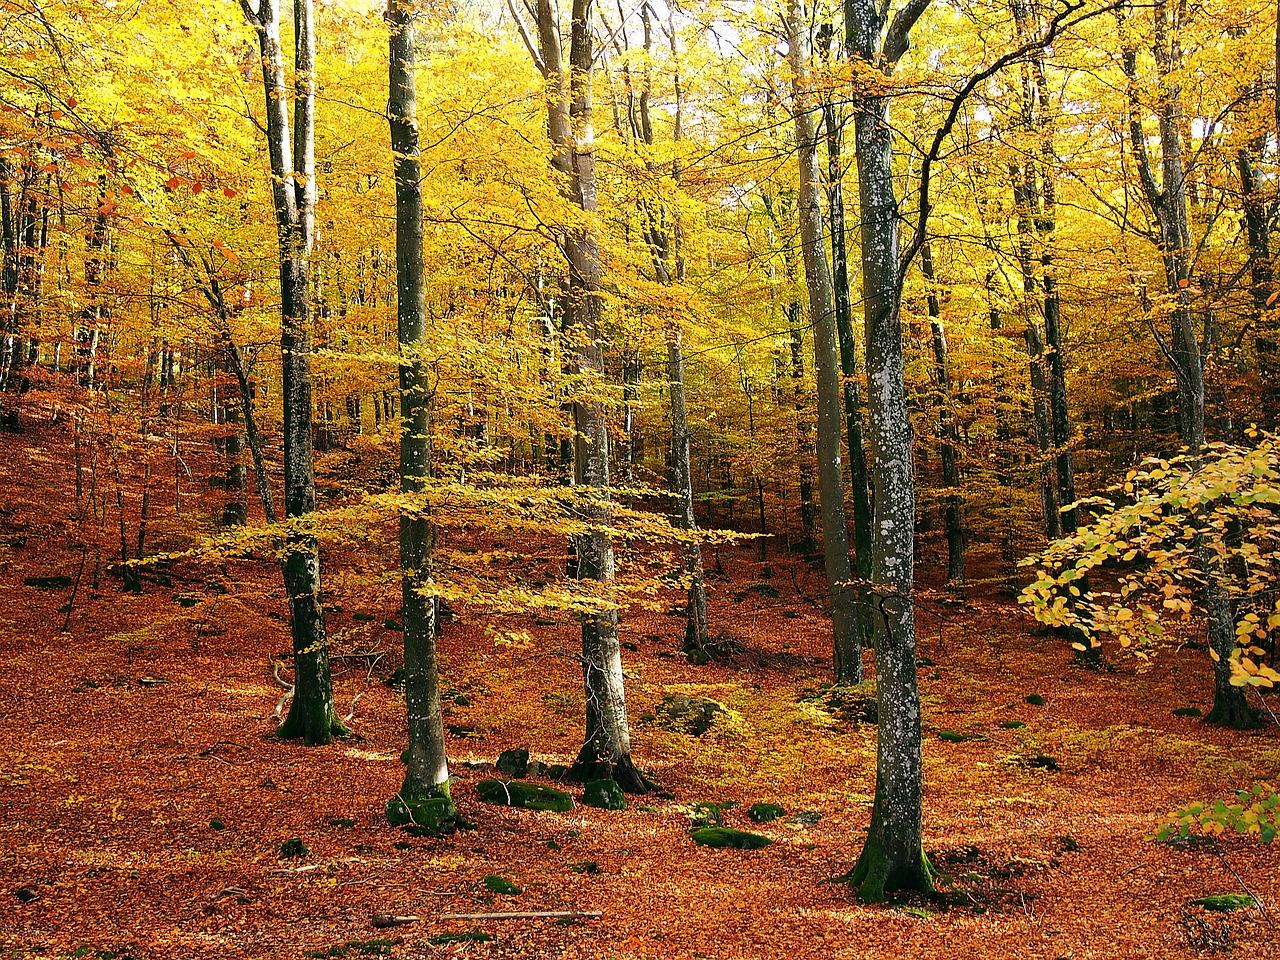 طبیعت پاییزی سوئد